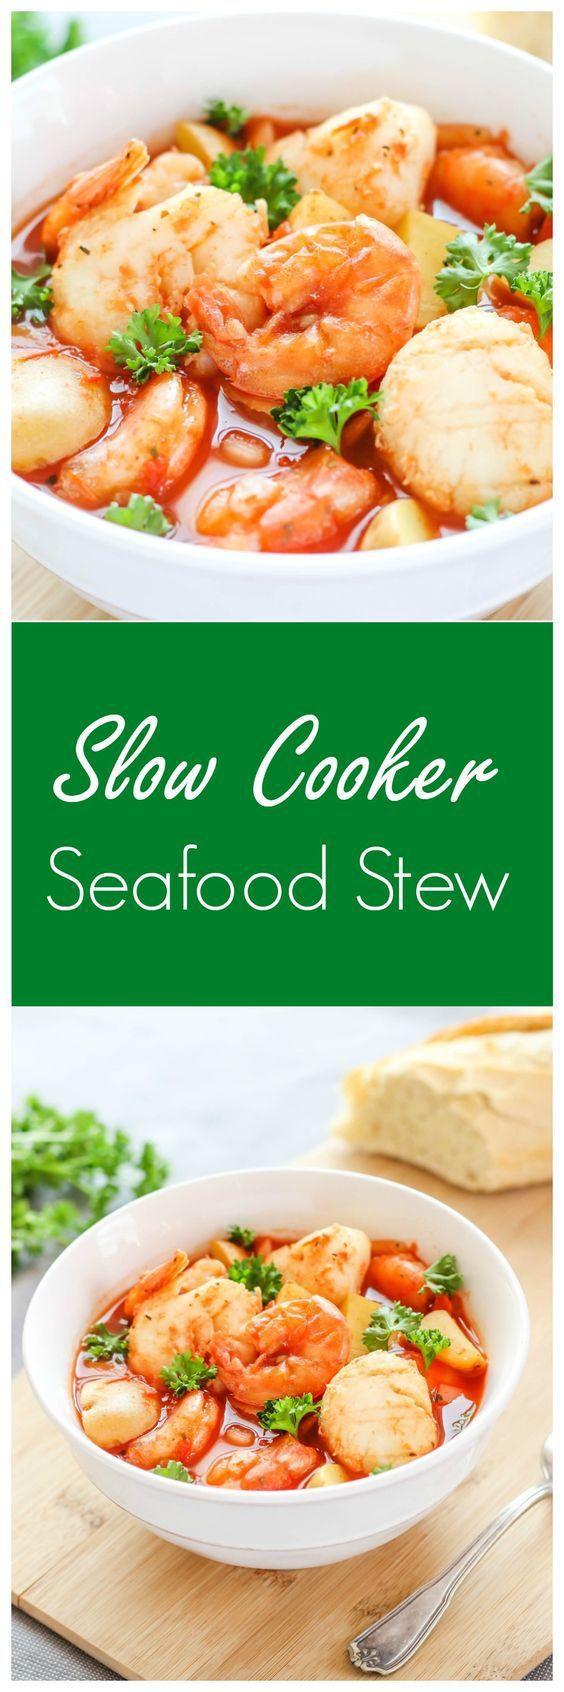 Slow Cooker Seafood Stew  Slow Cooker Seafood Stew – a delicious seafood recipe